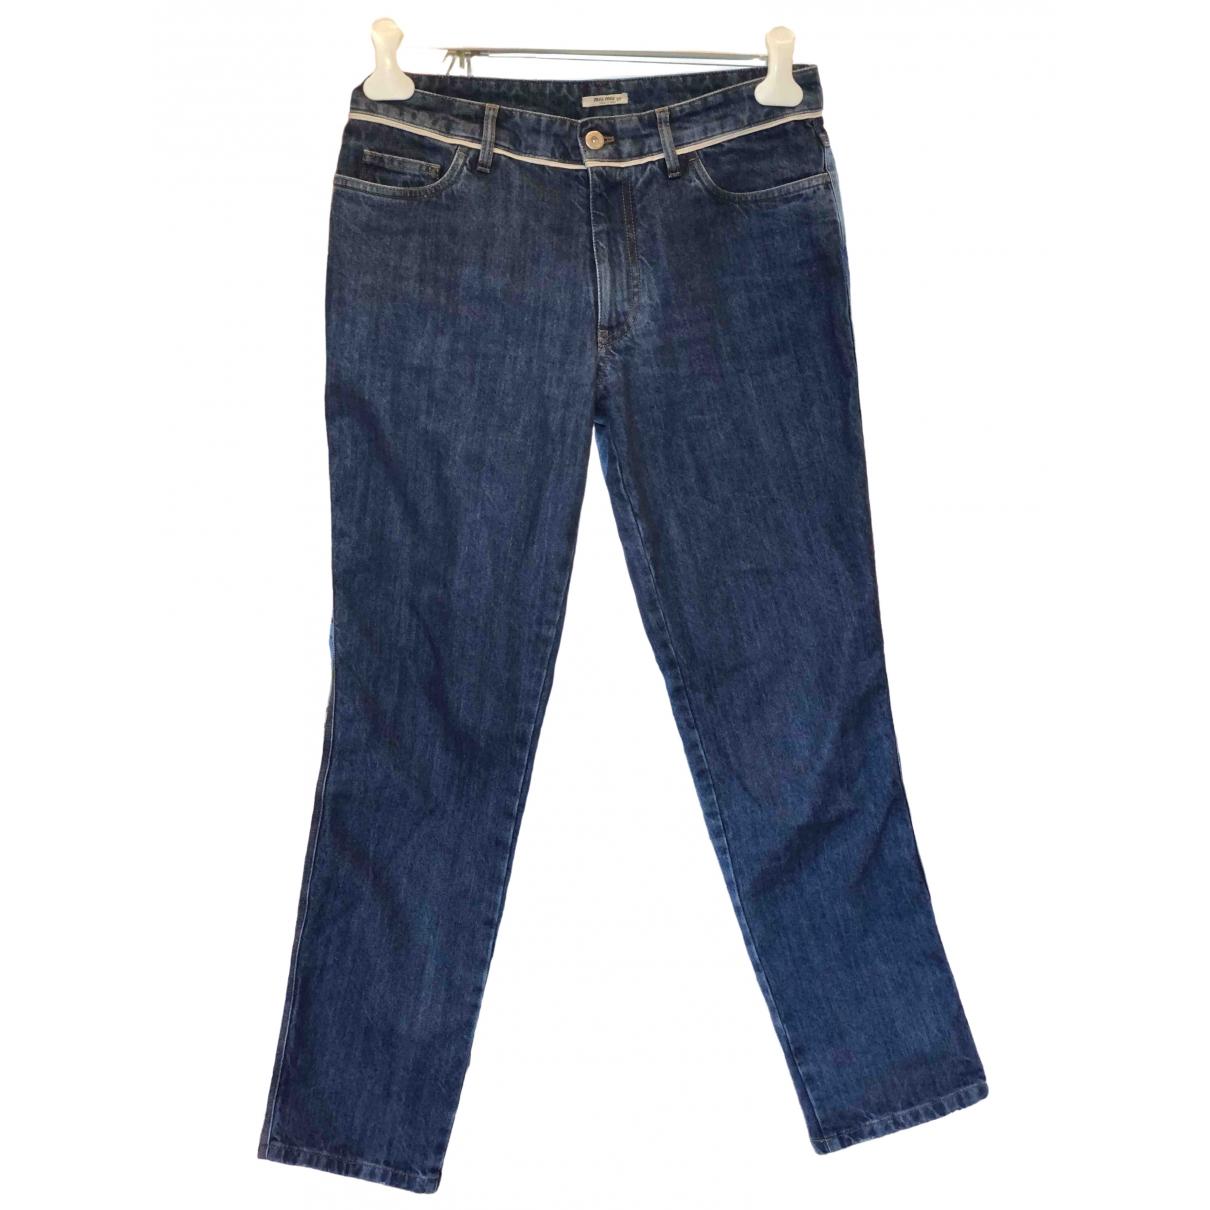 Miu Miu \N Denim - Jeans Jeans for Women 27 US